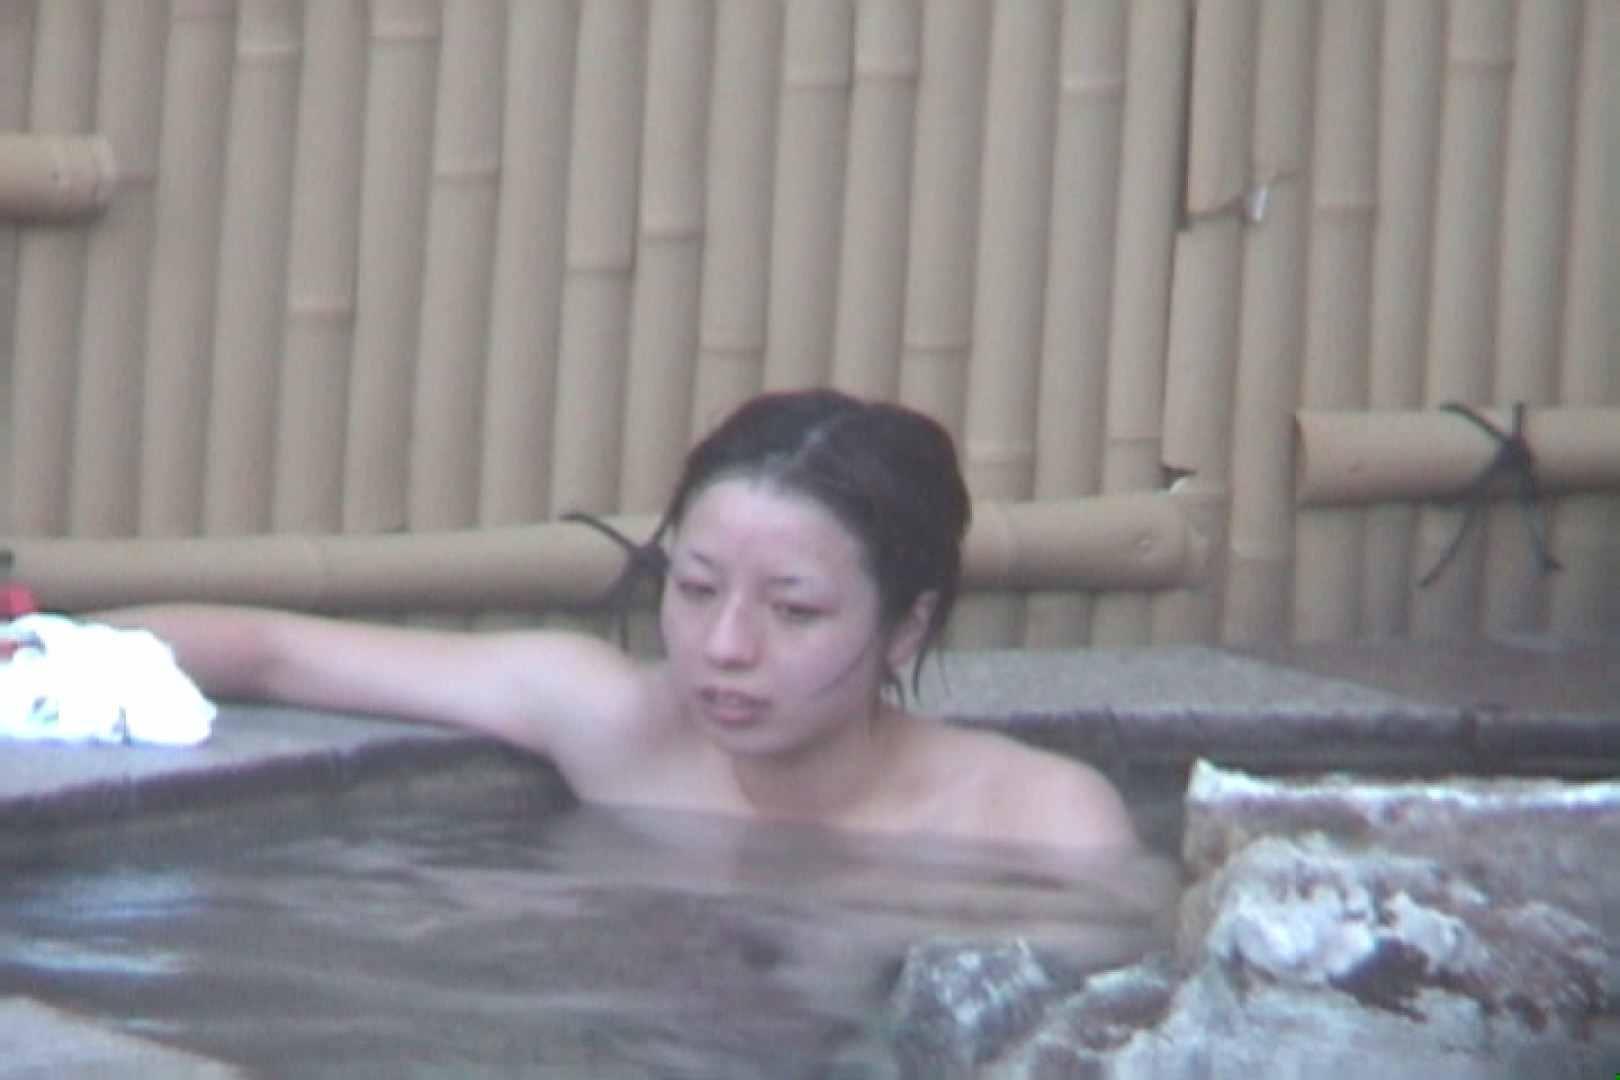 Aquaな露天風呂Vol.608 露天風呂 | OLのエロ生活  69連発 40